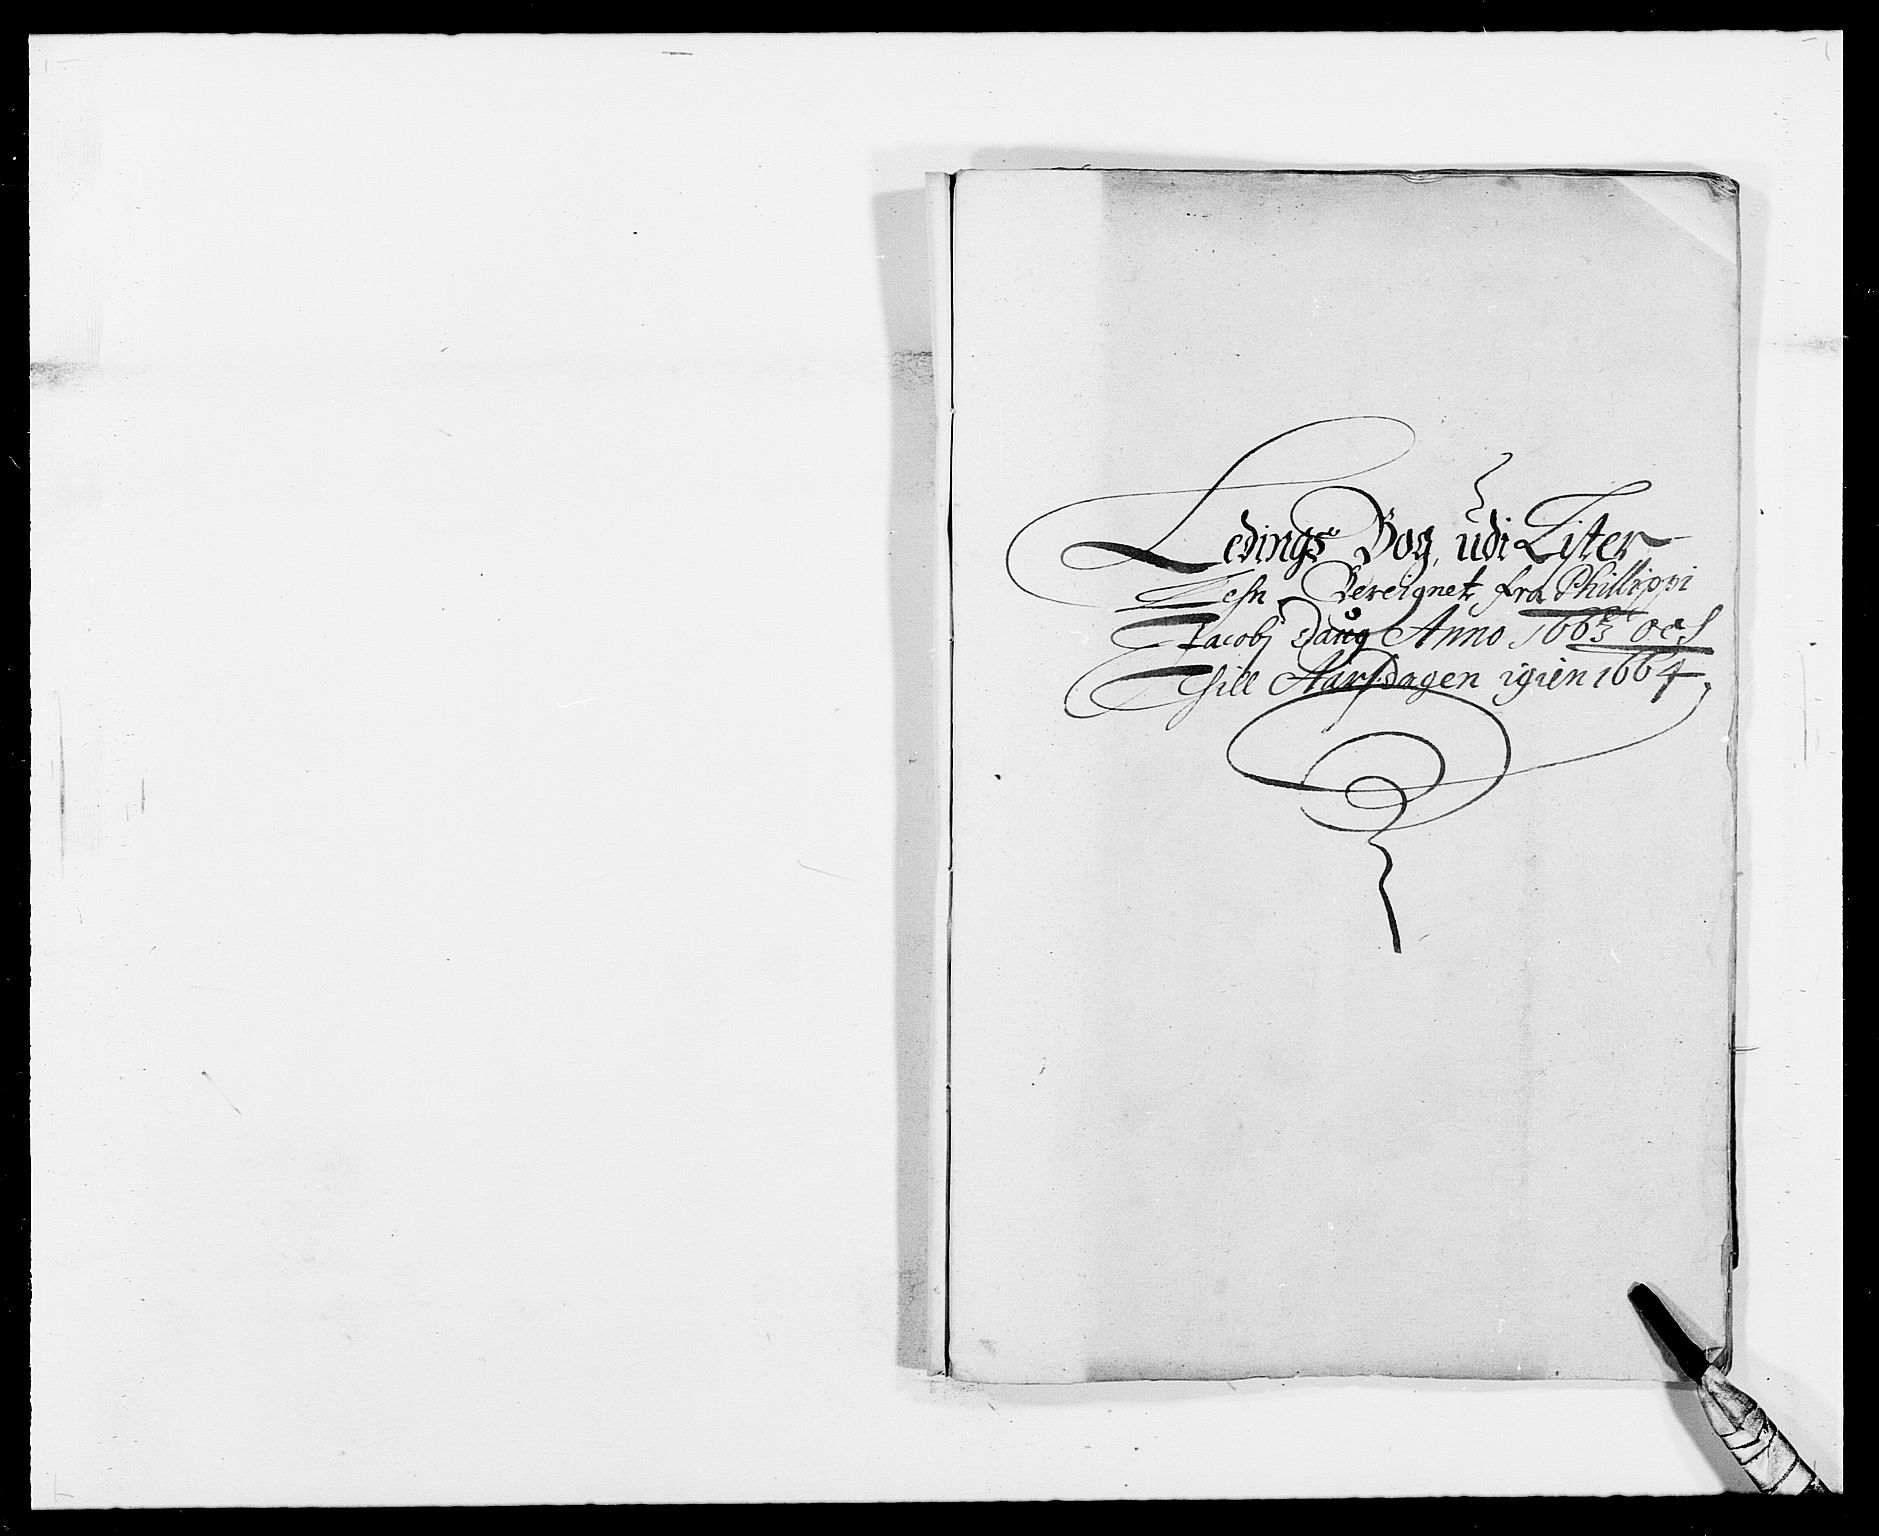 RA, Rentekammeret inntil 1814, Reviderte regnskaper, Fogderegnskap, R41/L2523: Fogderegnskap Lista, 1663-1664, s. 159